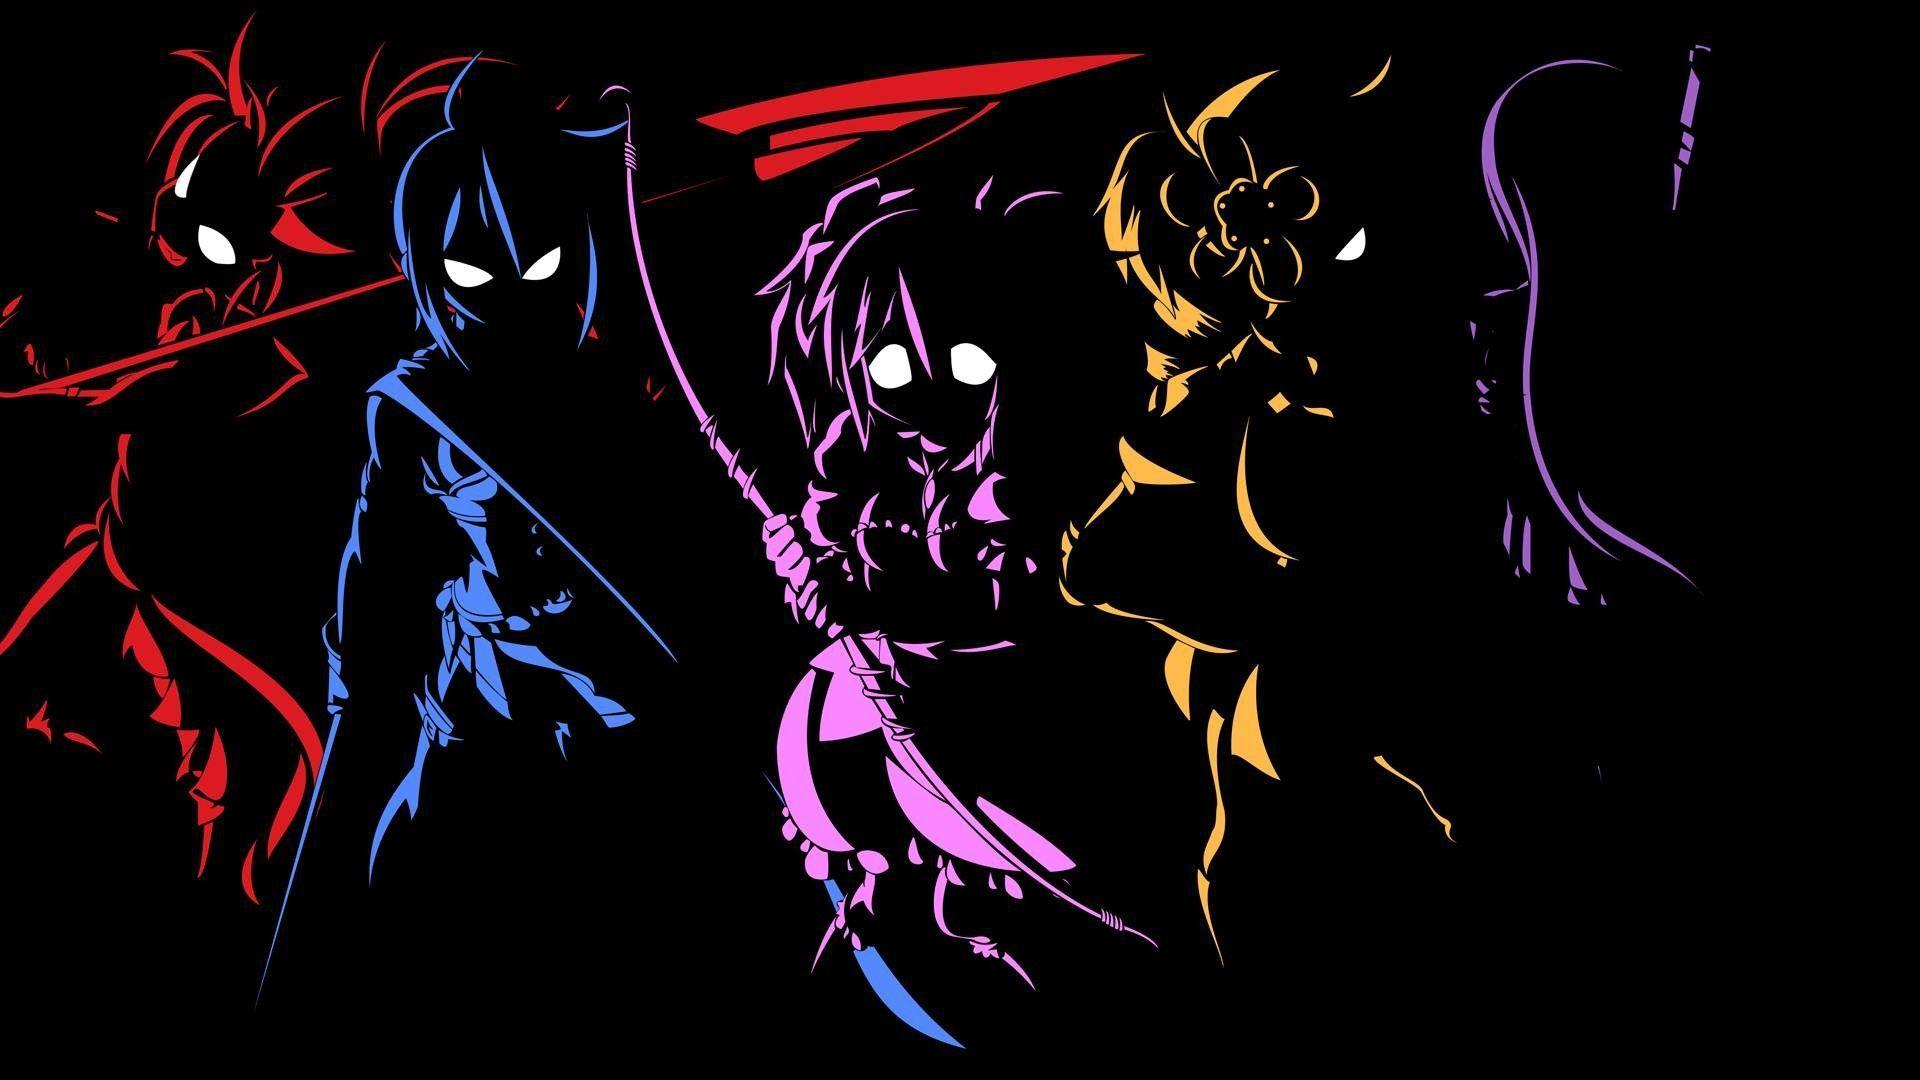 Minimal iPhone Dark Souls Wallpapers - Top Free Minimal ...